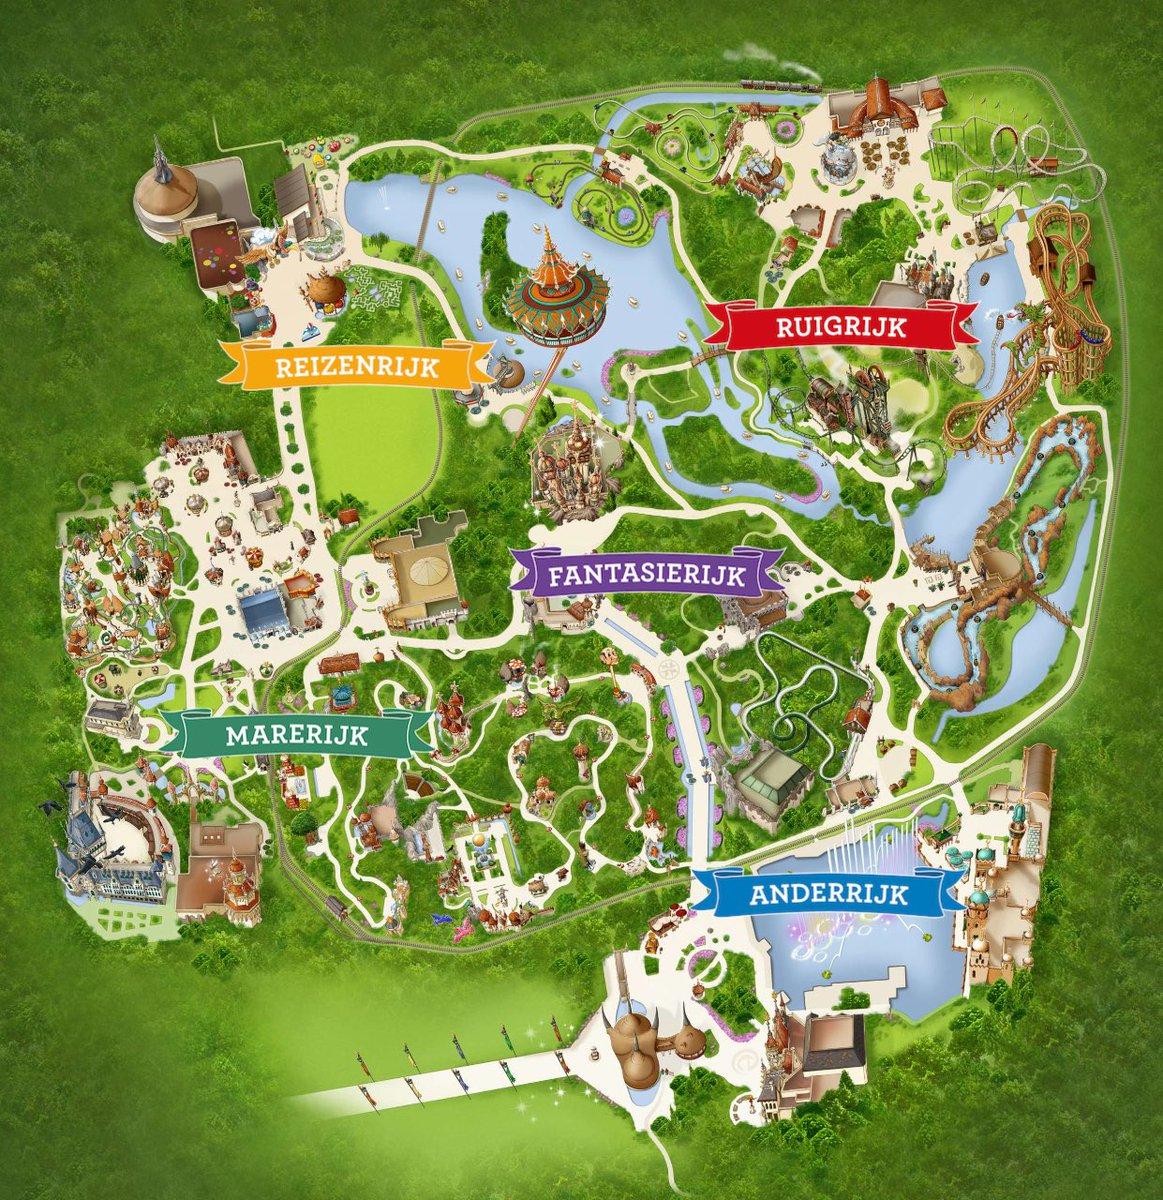 4 Парк делитс на 5 королевств.